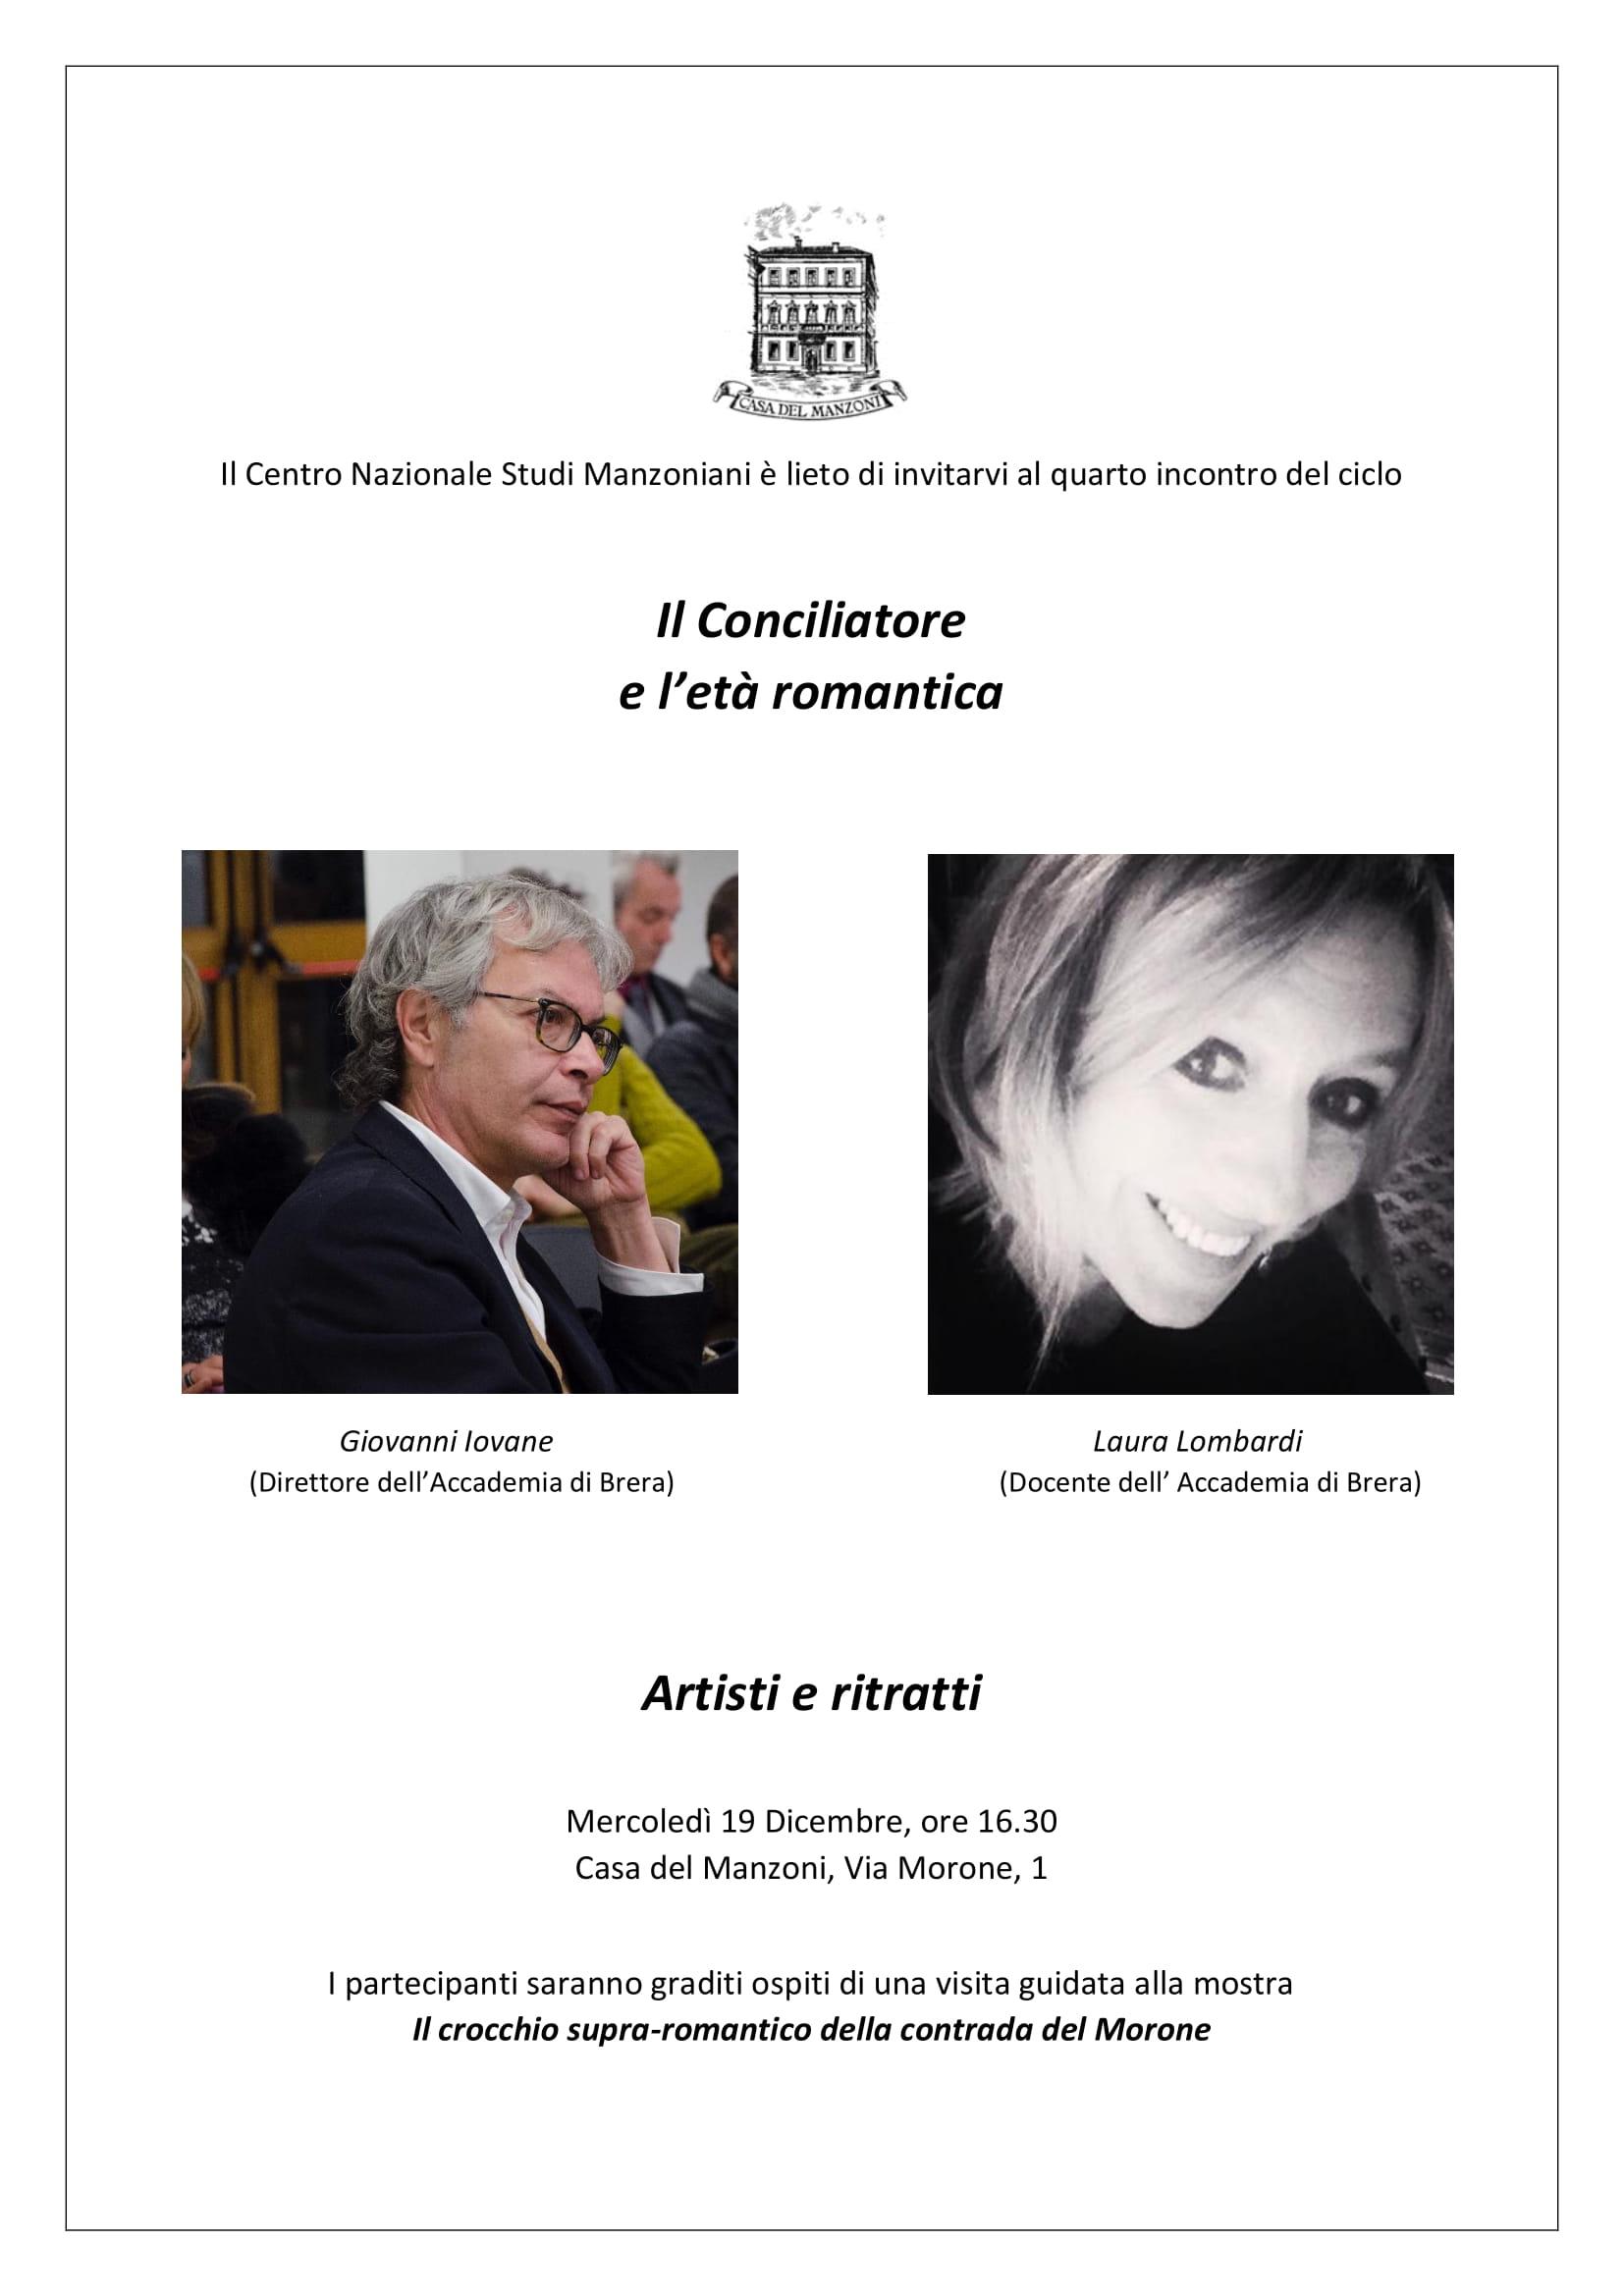 JPG locandina Iovane -Lombardi 19 dicembre 2018